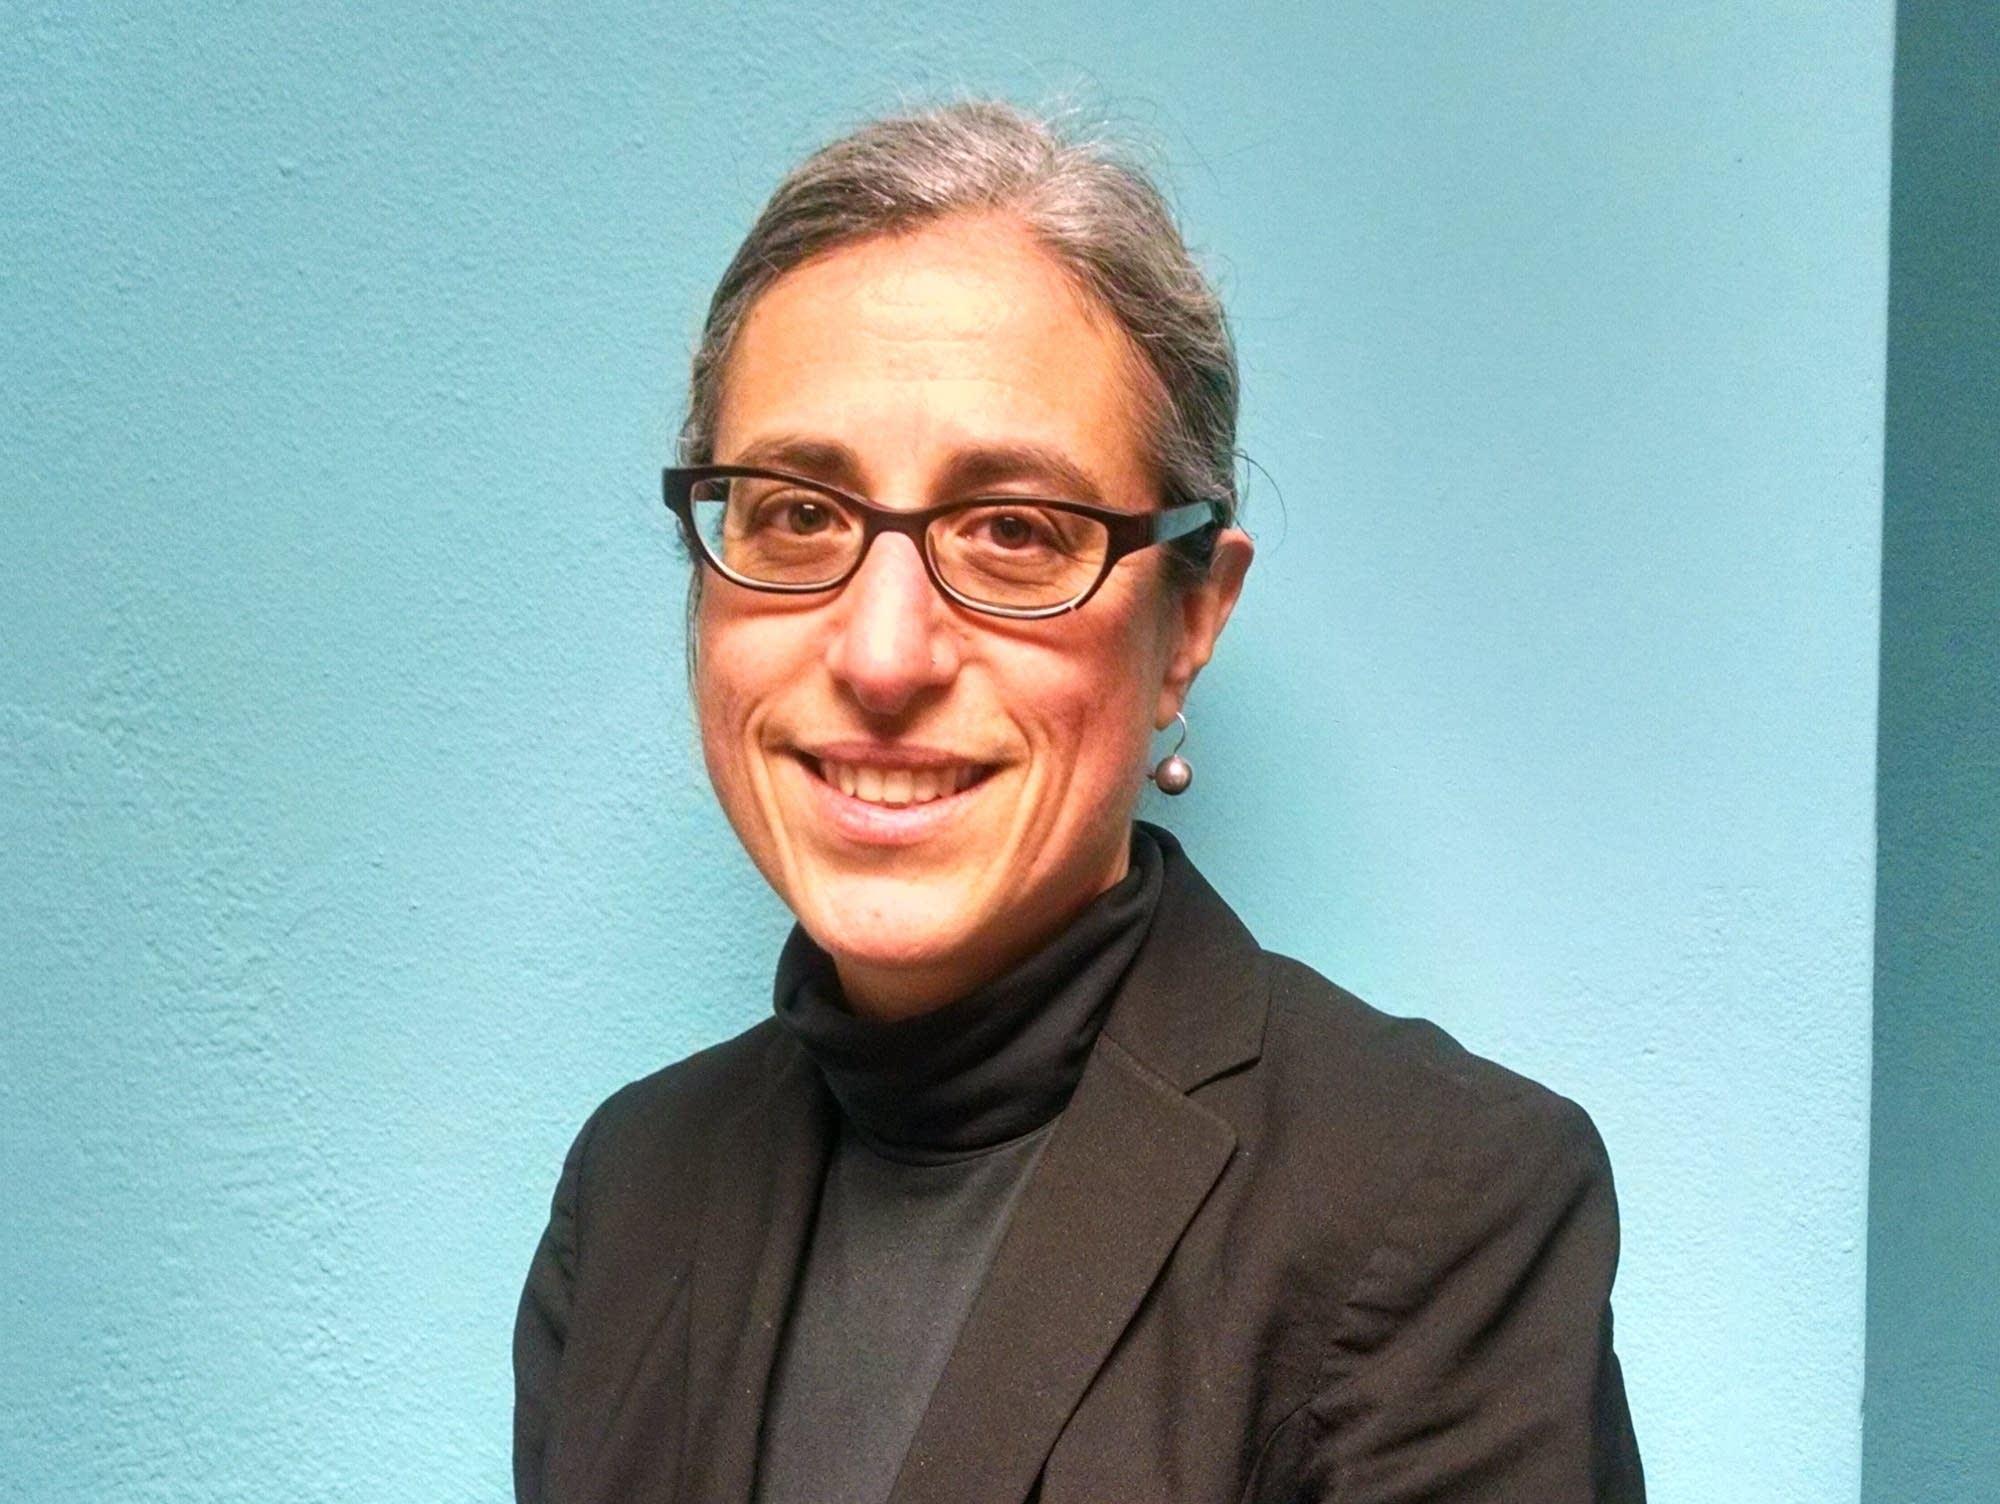 Tracy Fischman, CEO of Prepare and Prosper in St. Paul